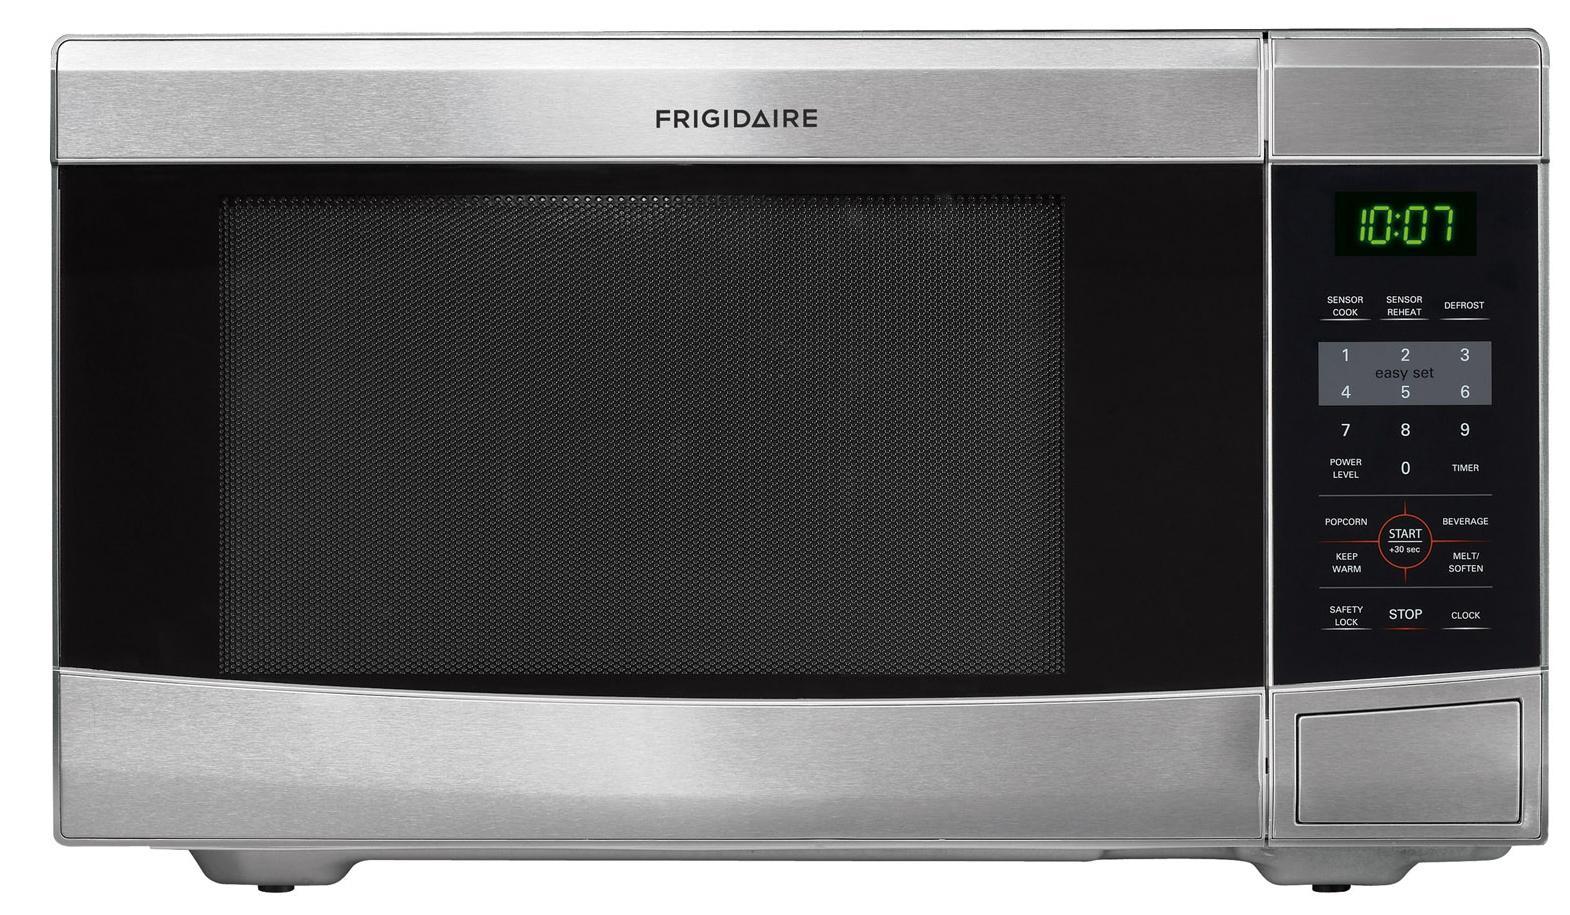 Frigidaire Microwaves 1.1 Cu. Ft. Countertop Microwave - Item Number: FFCM1134LS